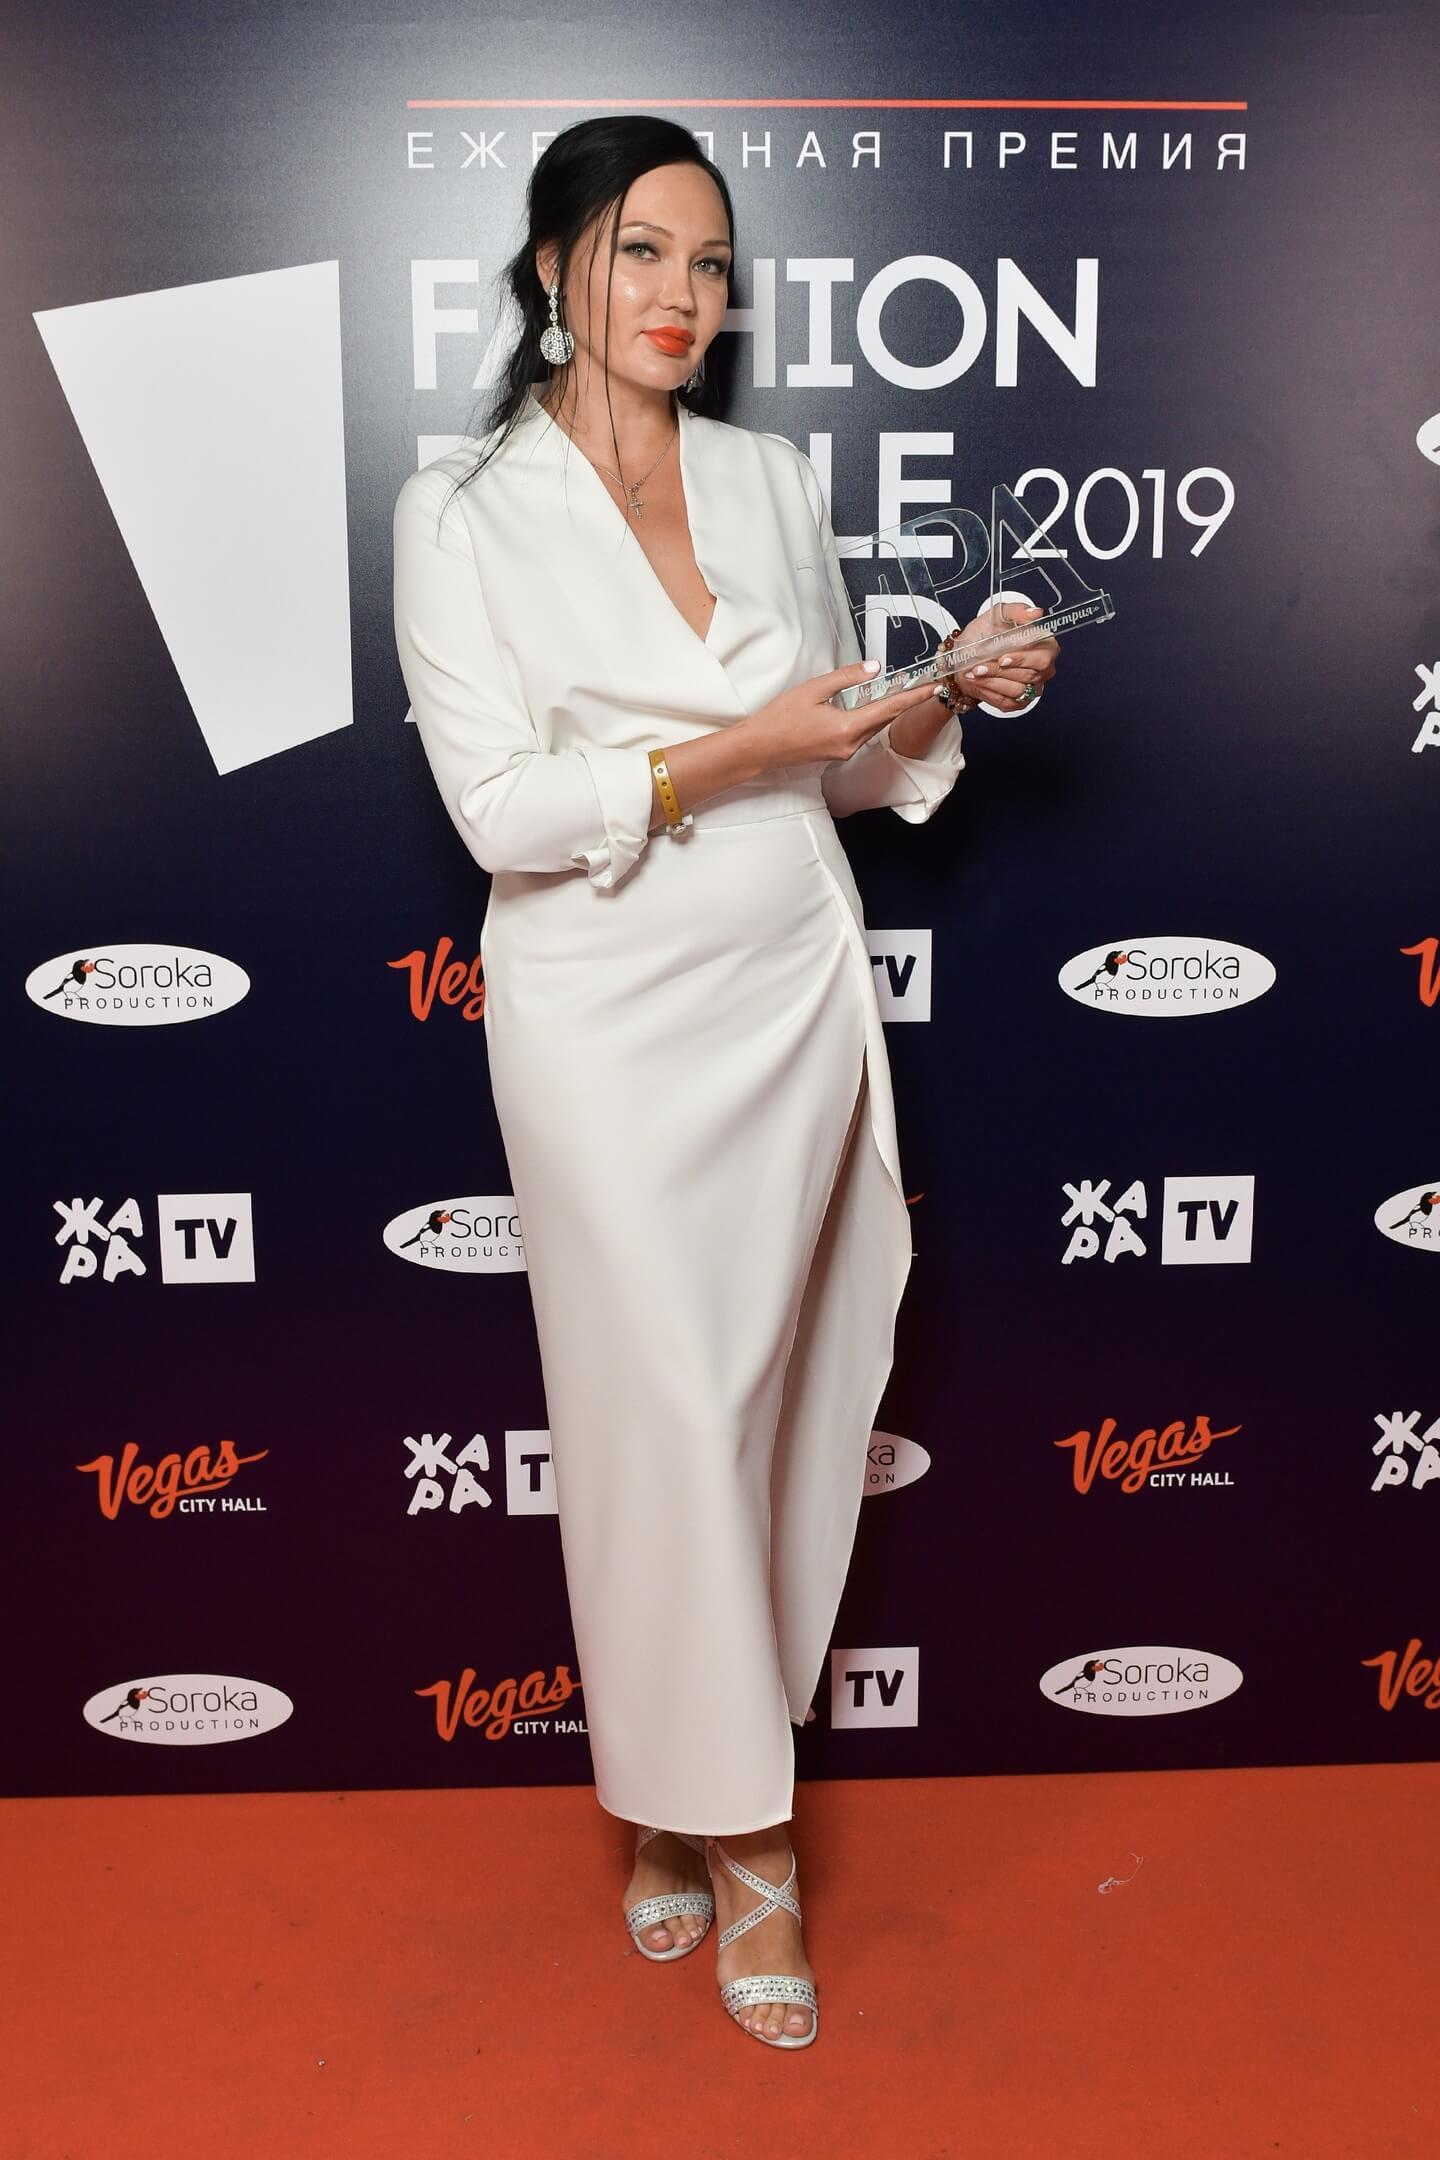 МИРА Fashion People Awards 2019